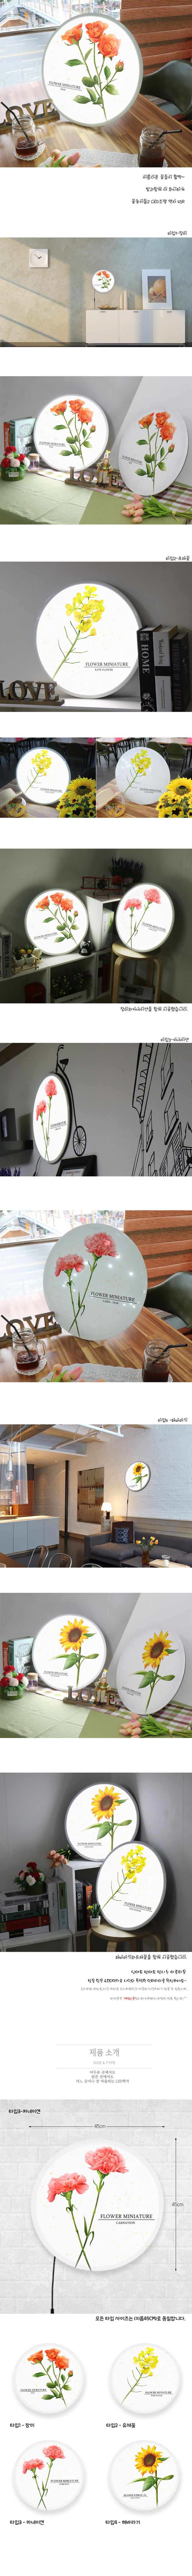 LED액자45R_꽃송이들2 - 꾸밈, 86,000원, 포인트조명, 터치조명